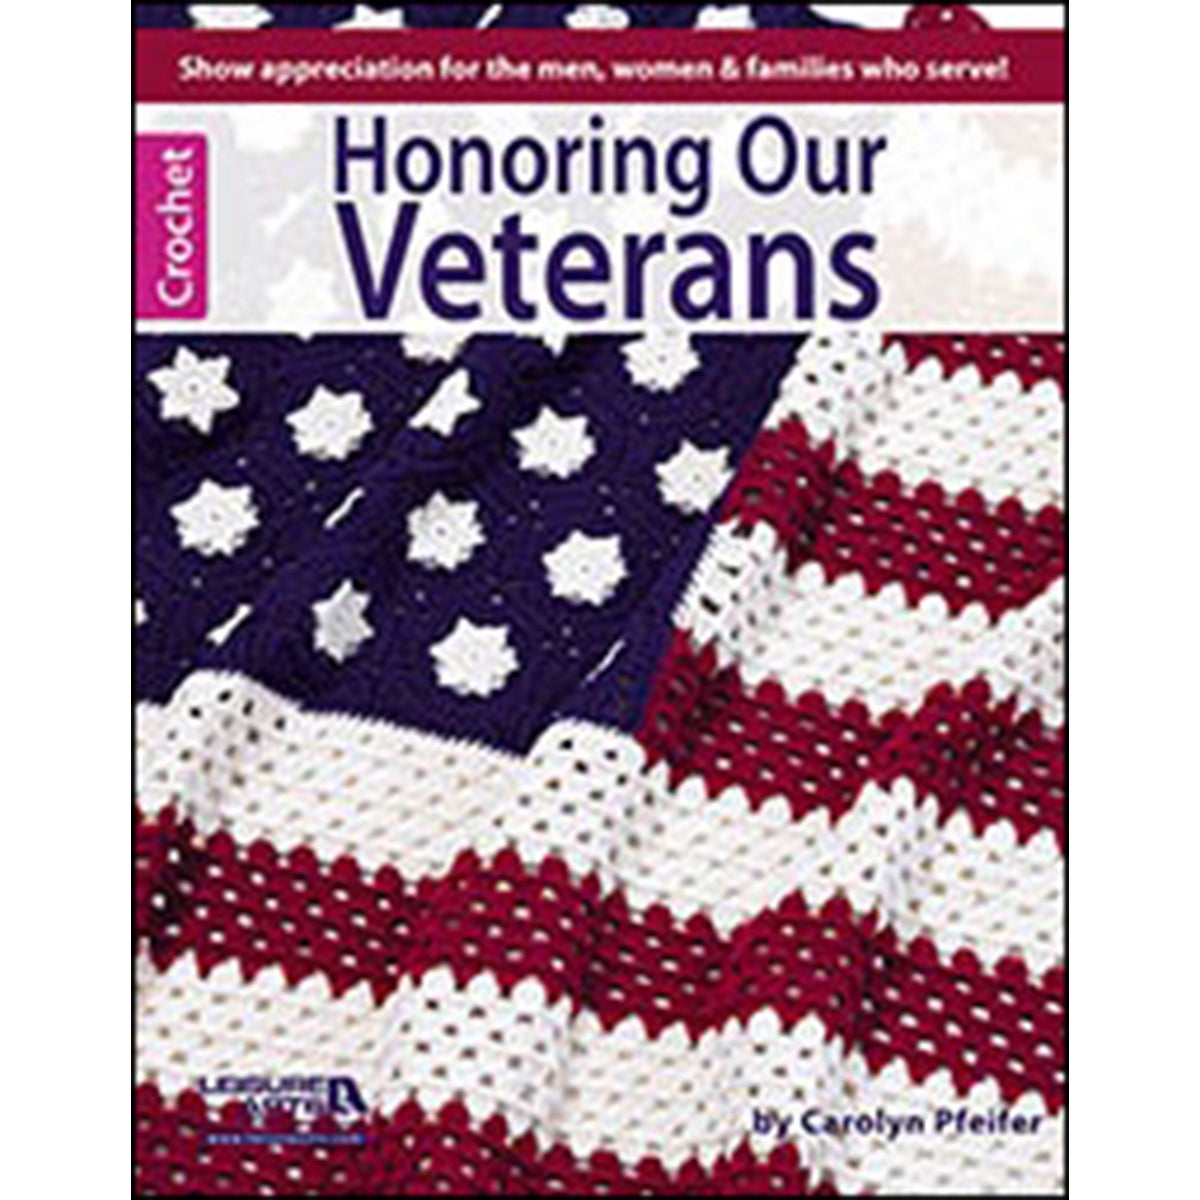 Leisure Arts-Honoring Our Veterans (Honoring Our Veterans)